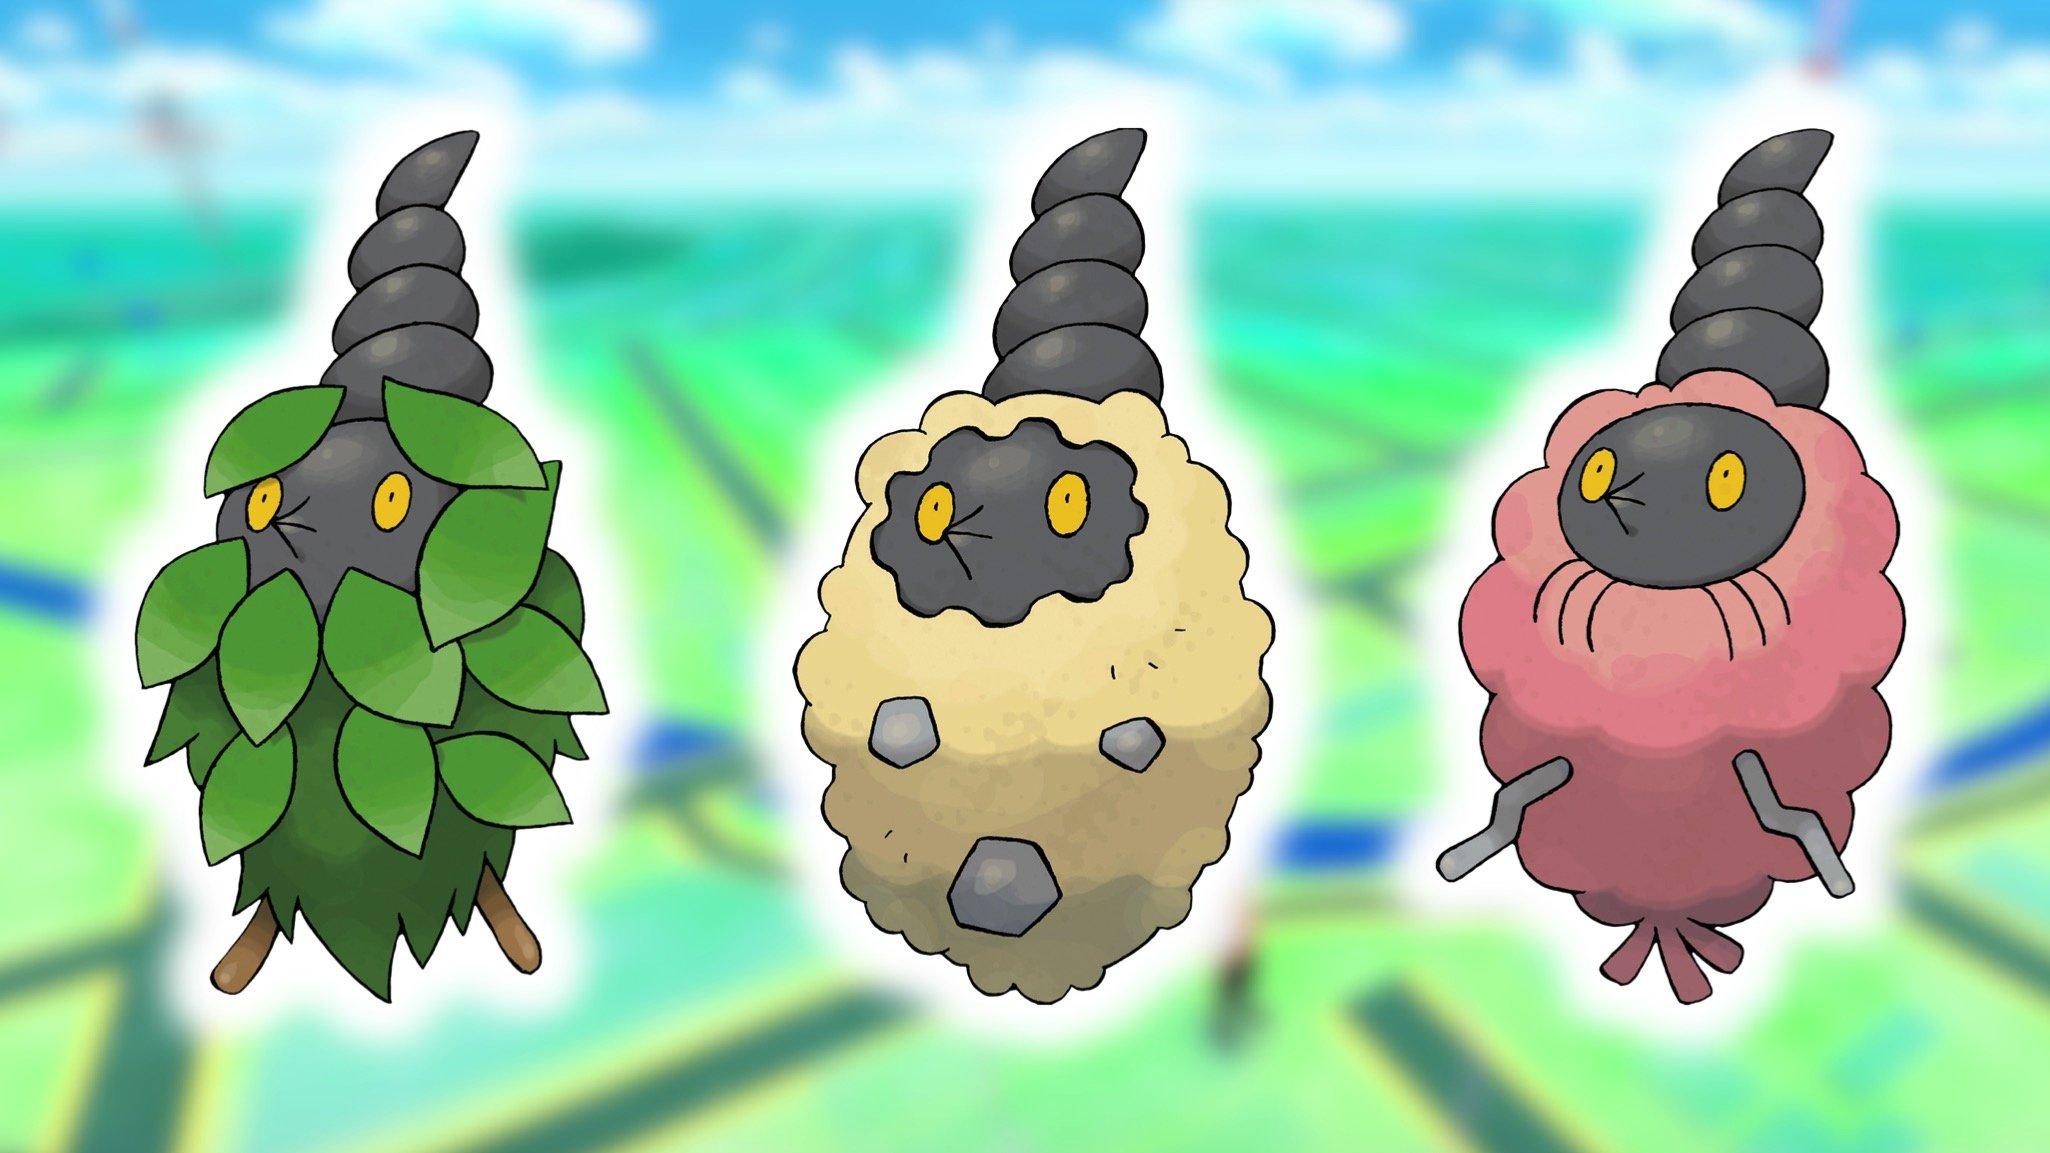 Burmy In Pokémon GO - Where To Find Plant, Sandy And Trash Cloaks